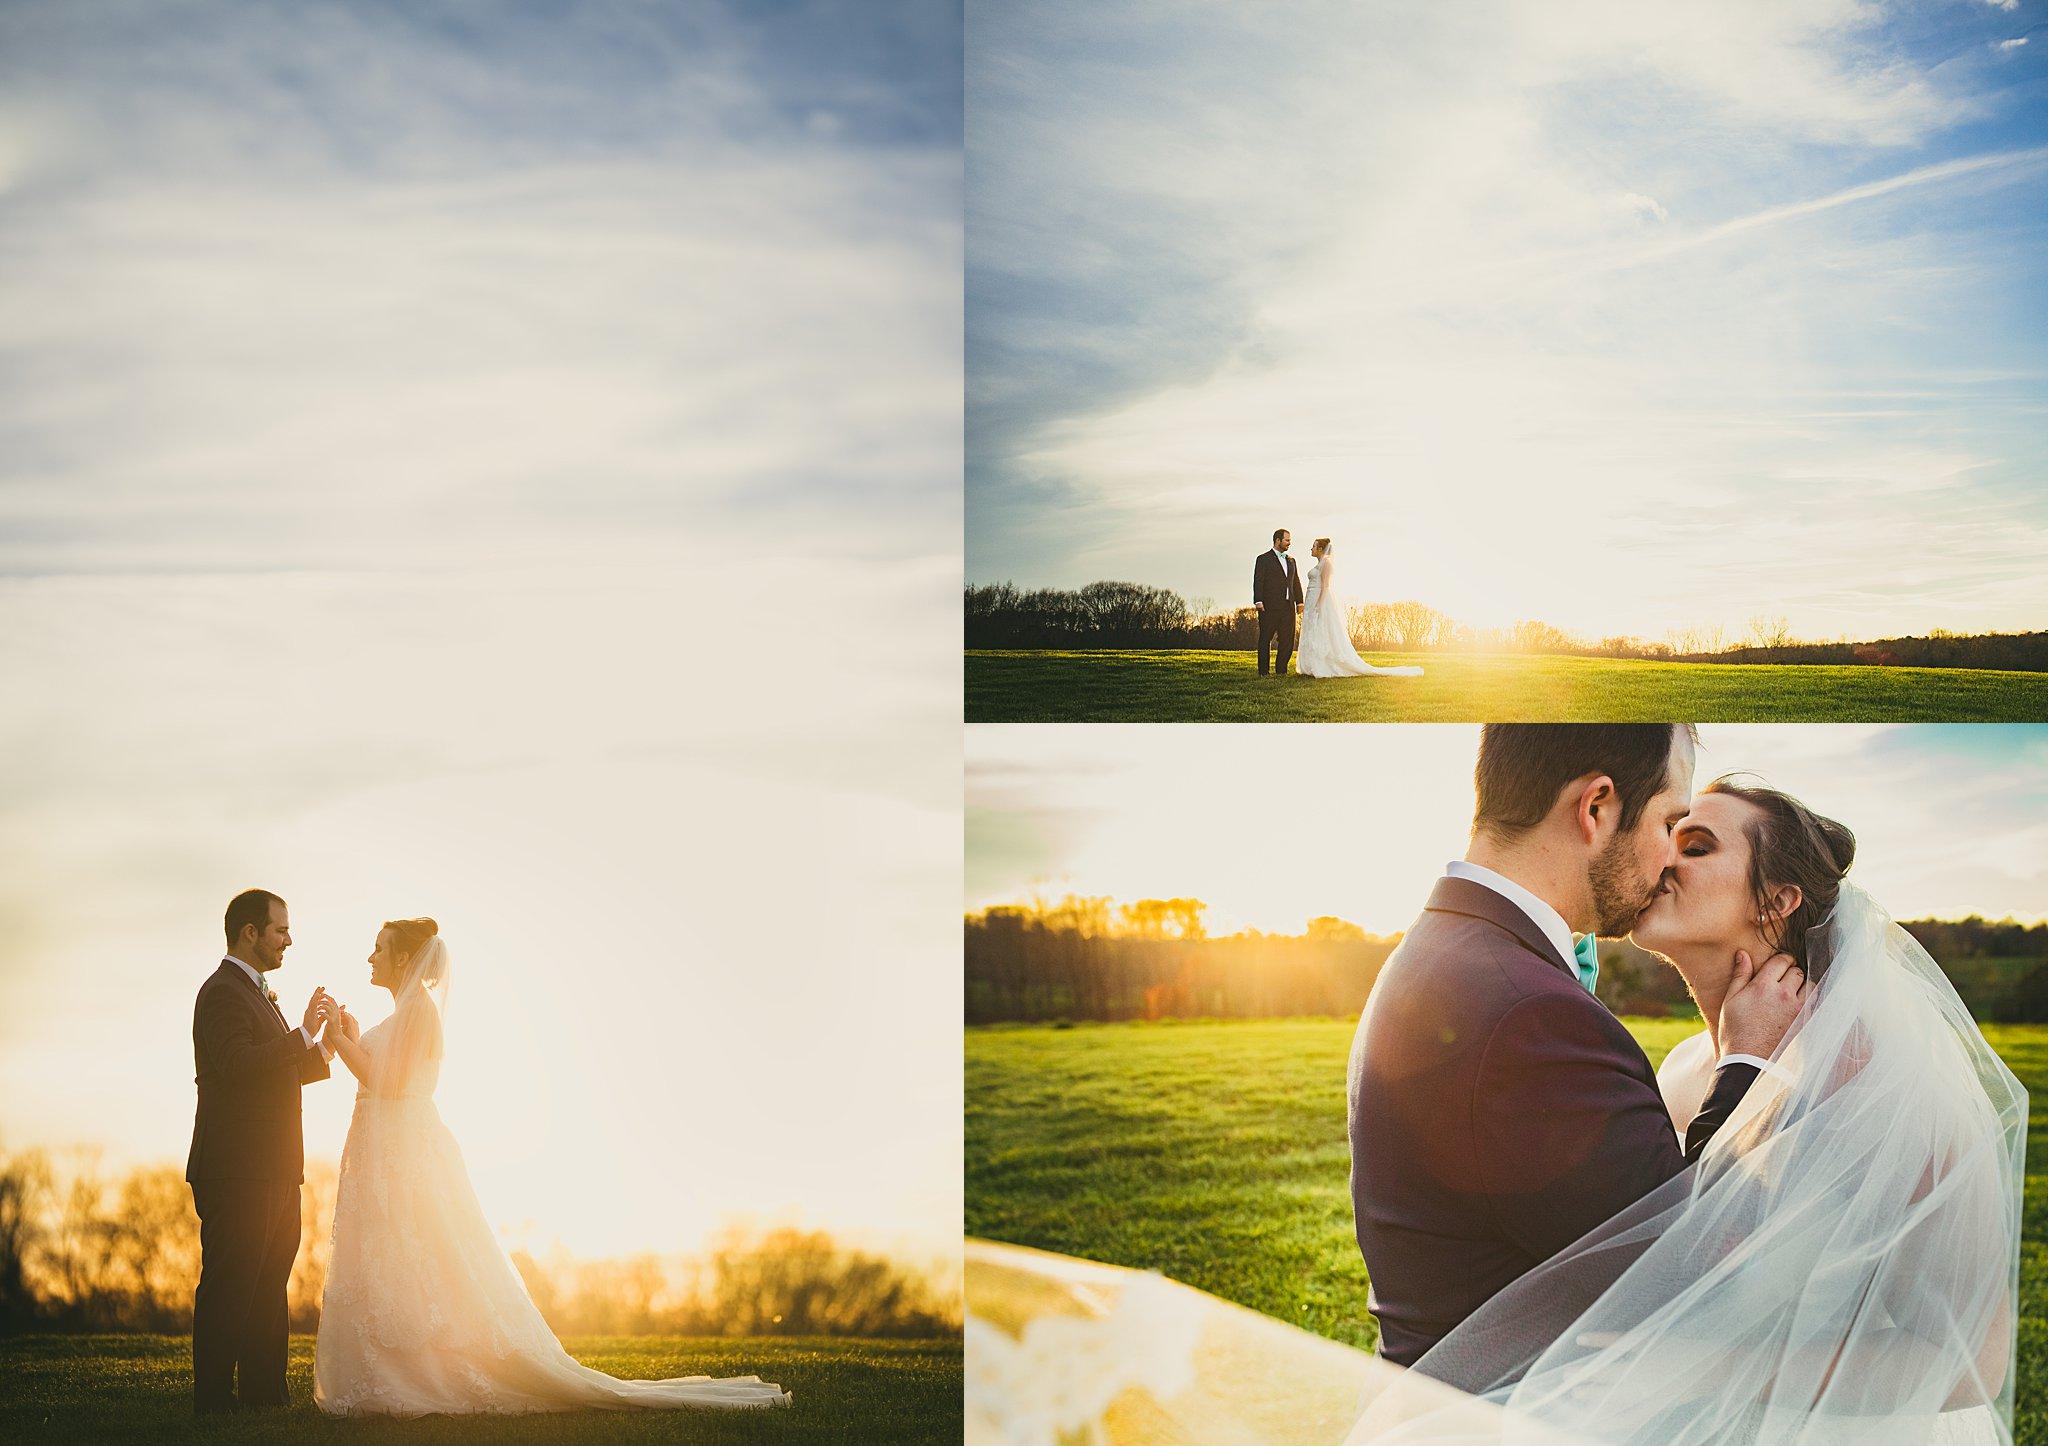 Atlanta Wedding Photographer West Milford Farms